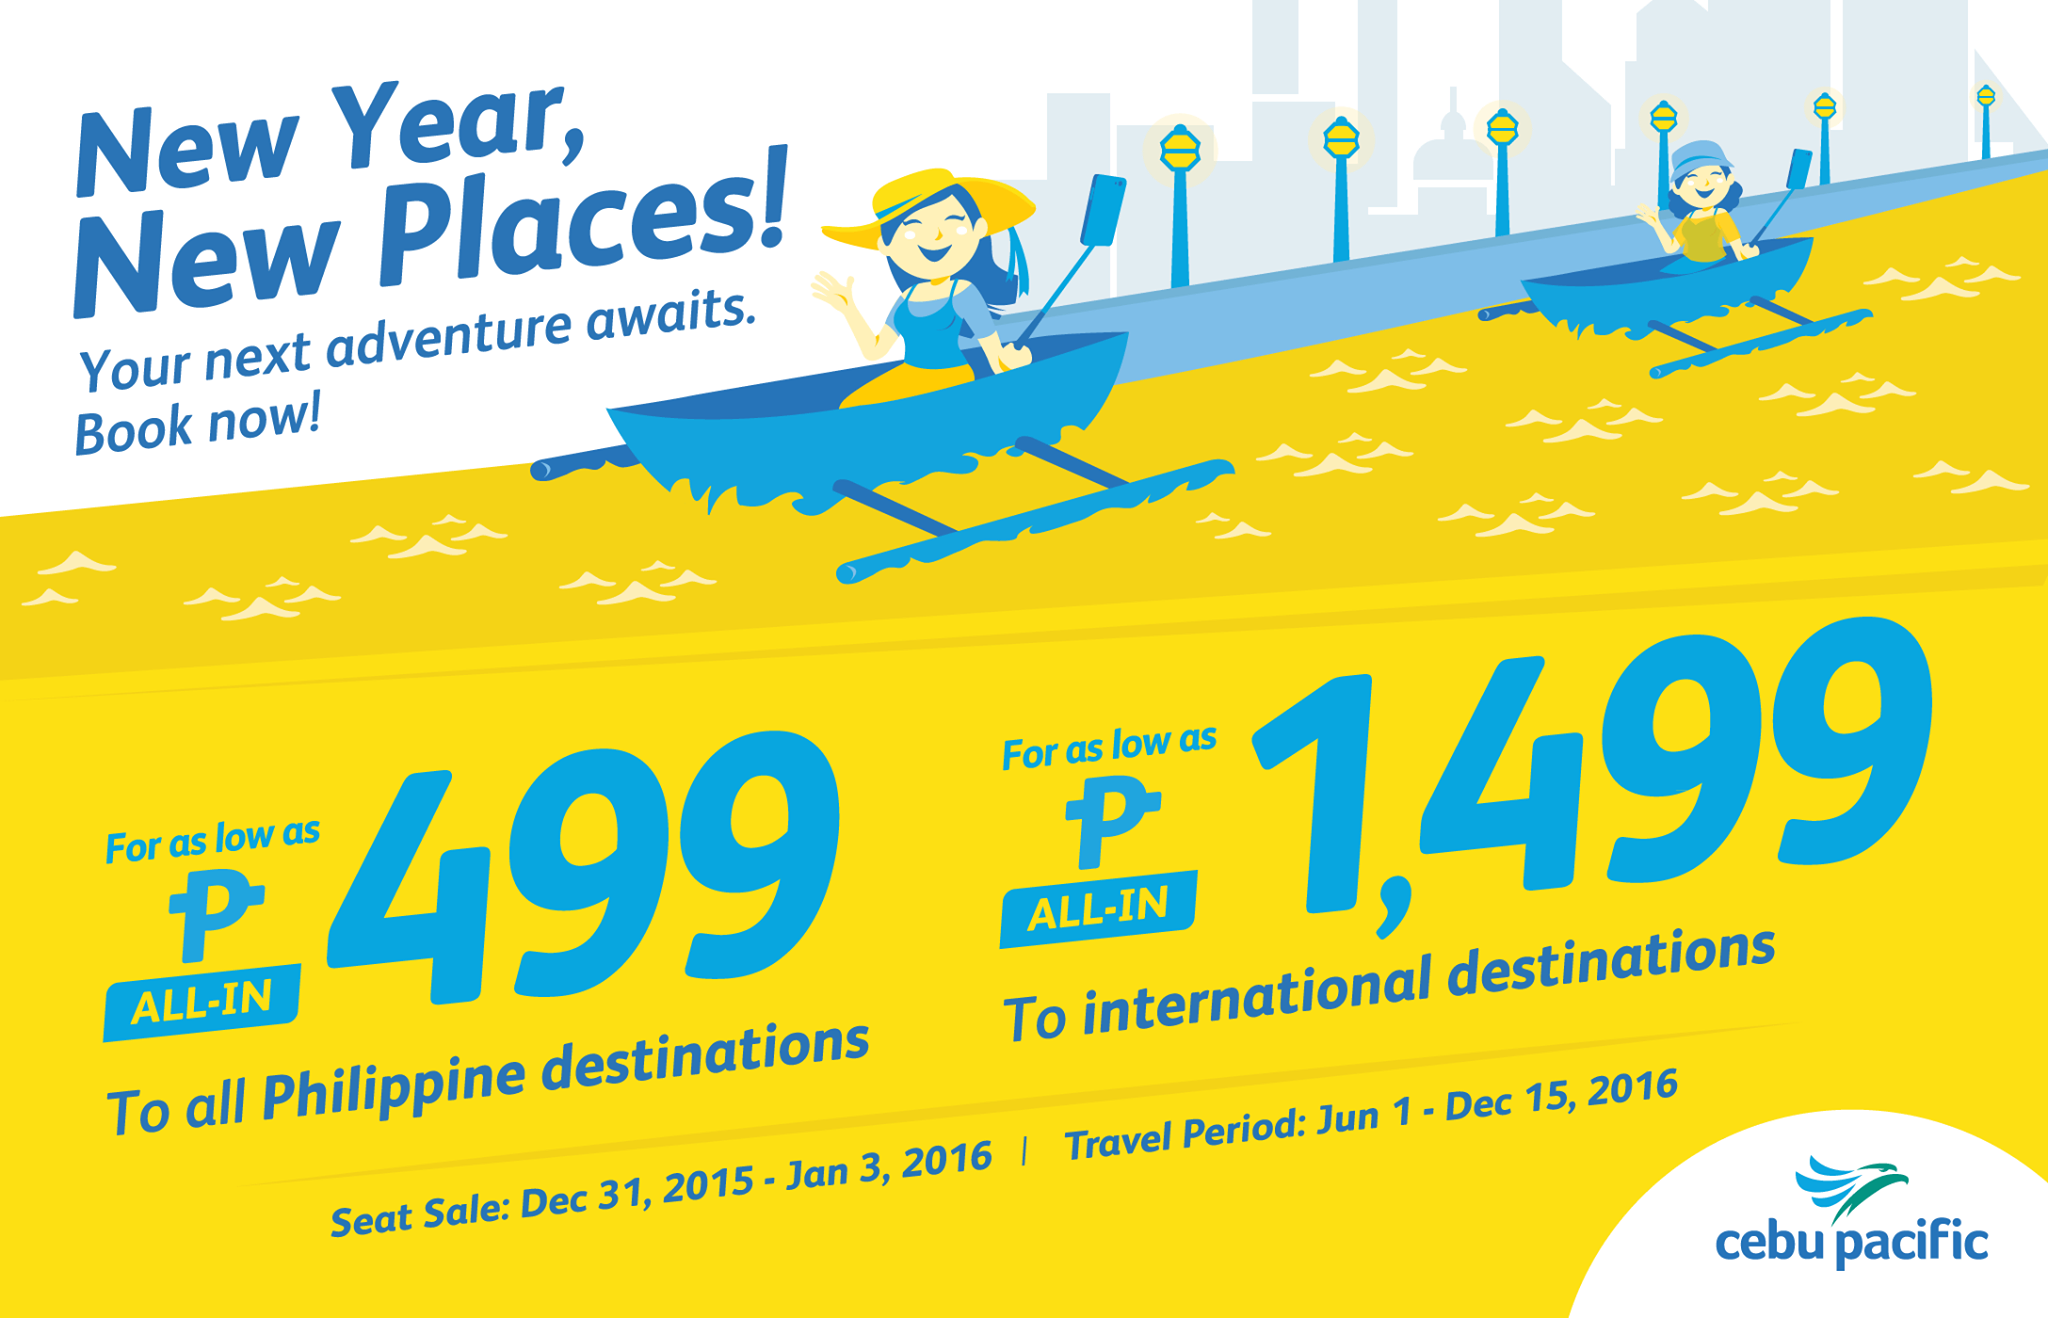 Cebu Pacific Promo December 31 2015